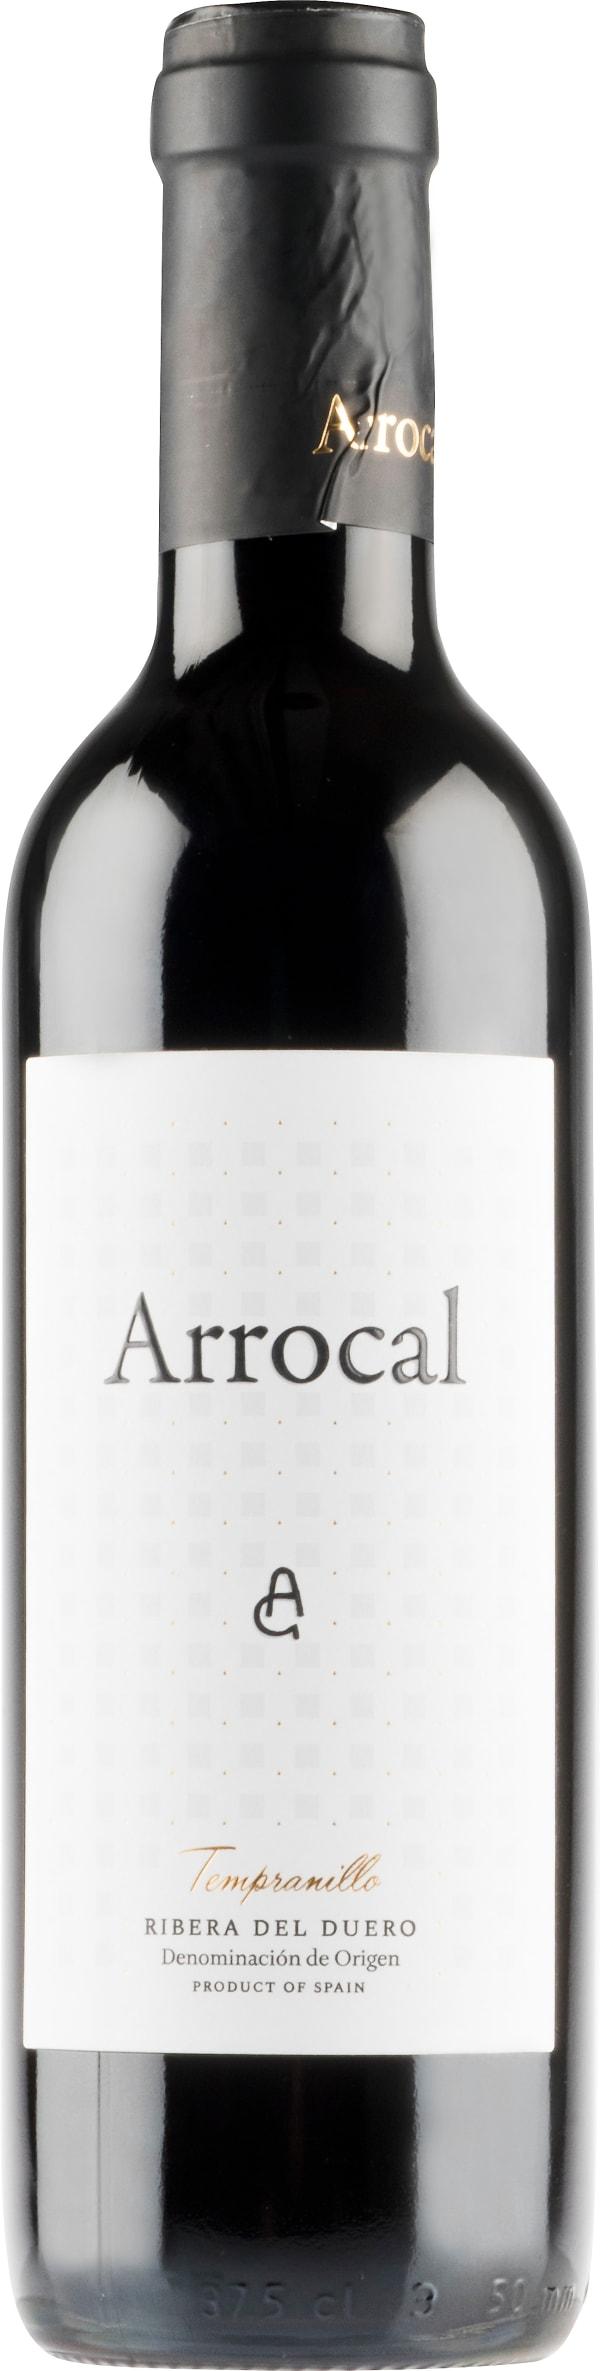 Arrocal 2014